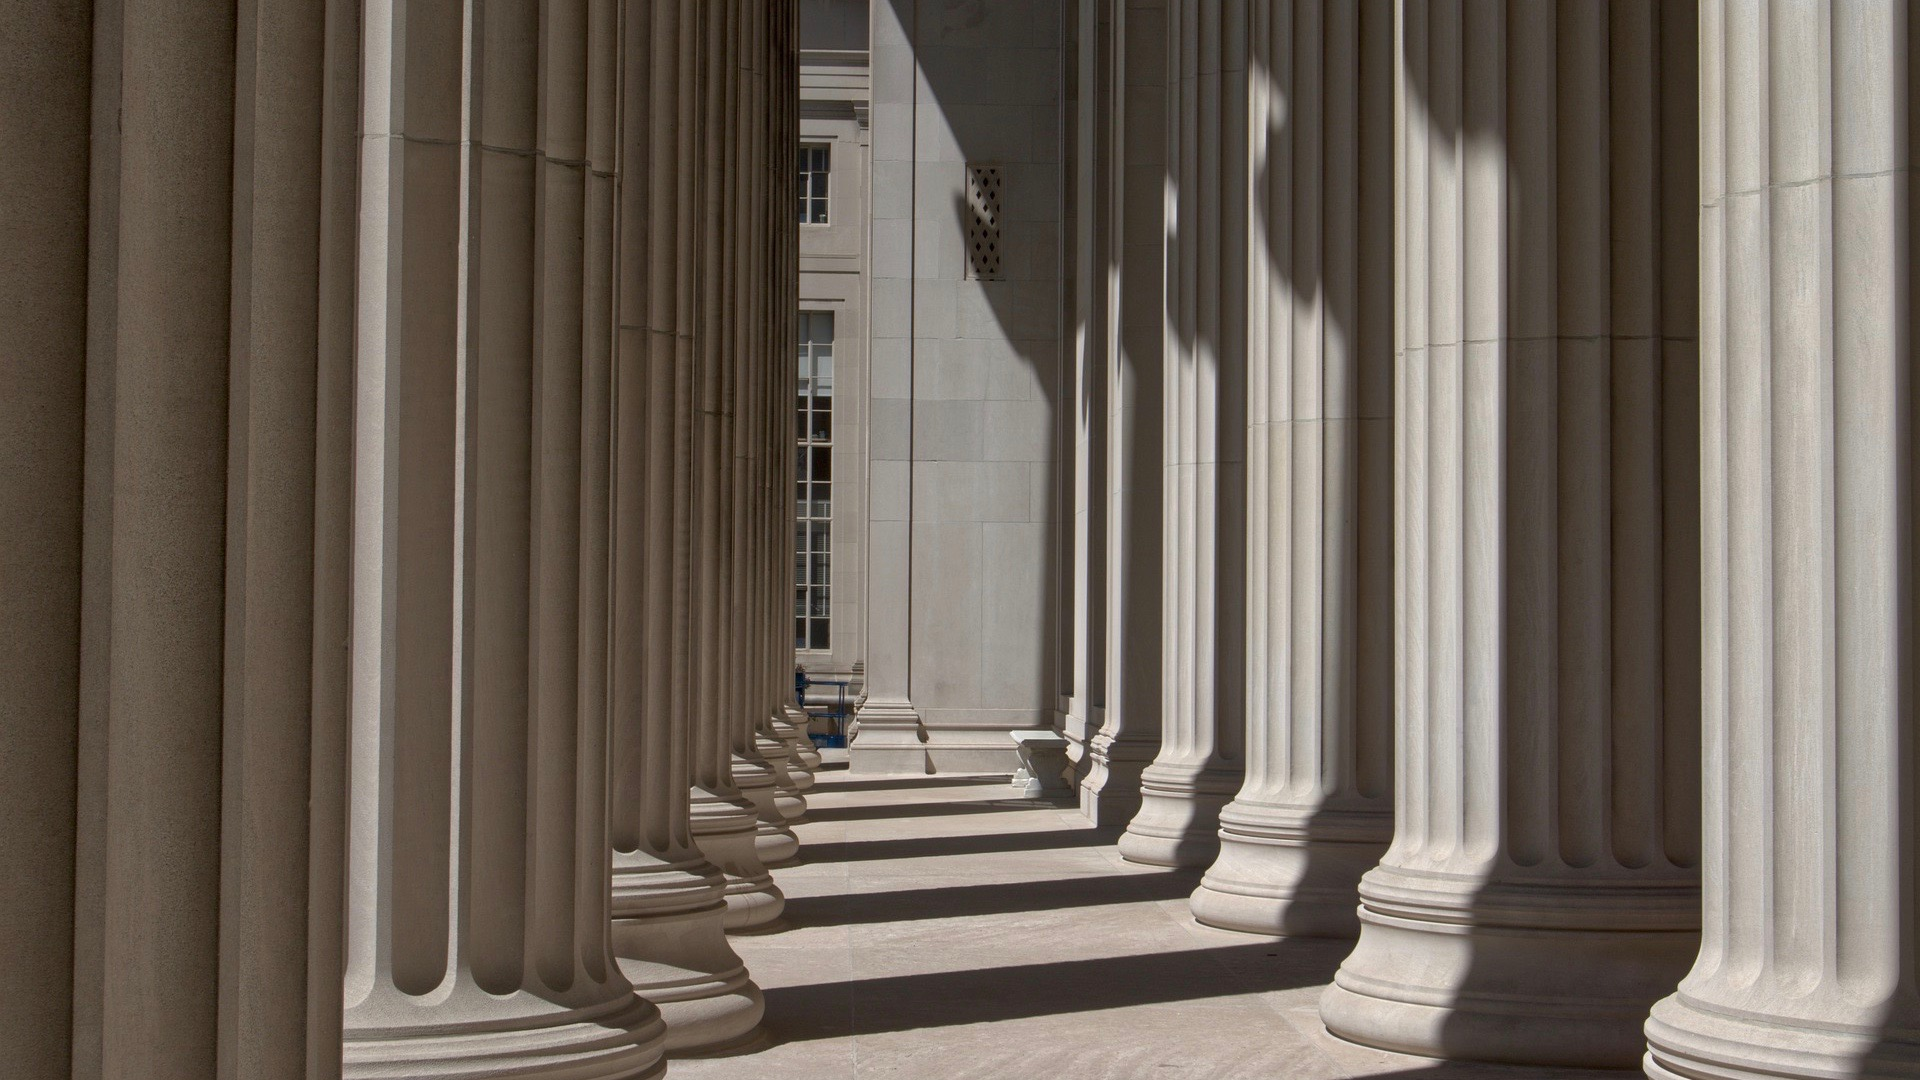 columns-5135499_1920 2